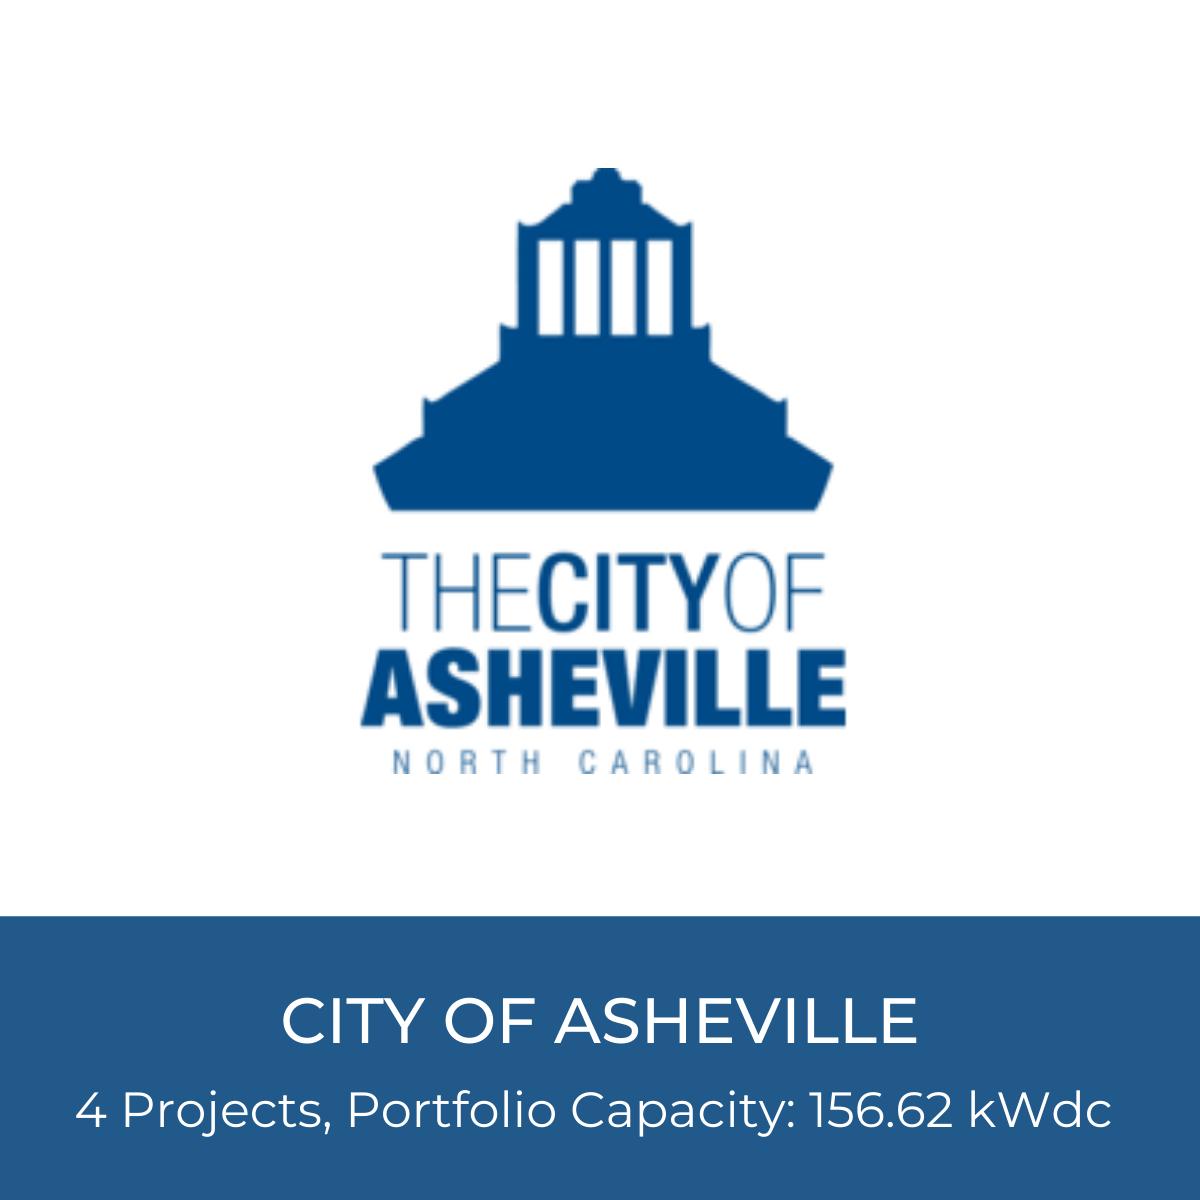 City of Asheville Logo, 4 Solar Projects, Portfolio Capacity: 156.62 kWdc